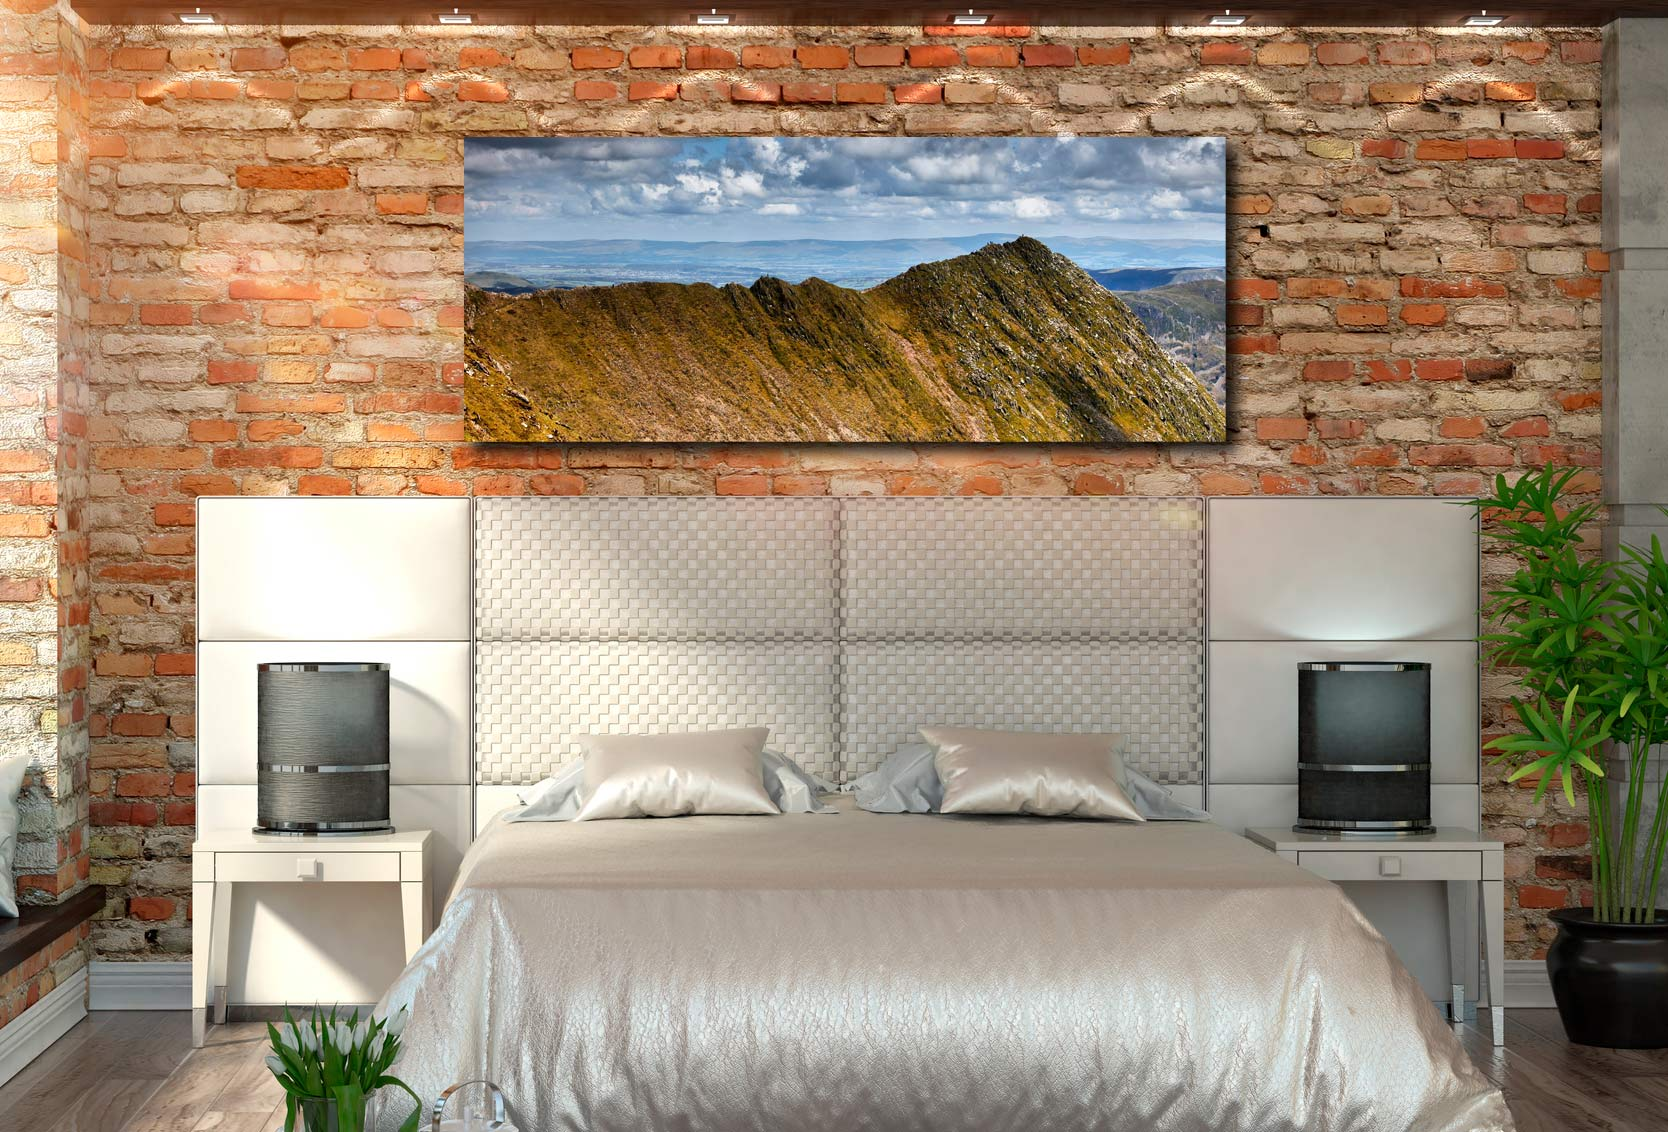 Striding Edge - Print Aluminium Backing With Acrylic Glazing on Wall